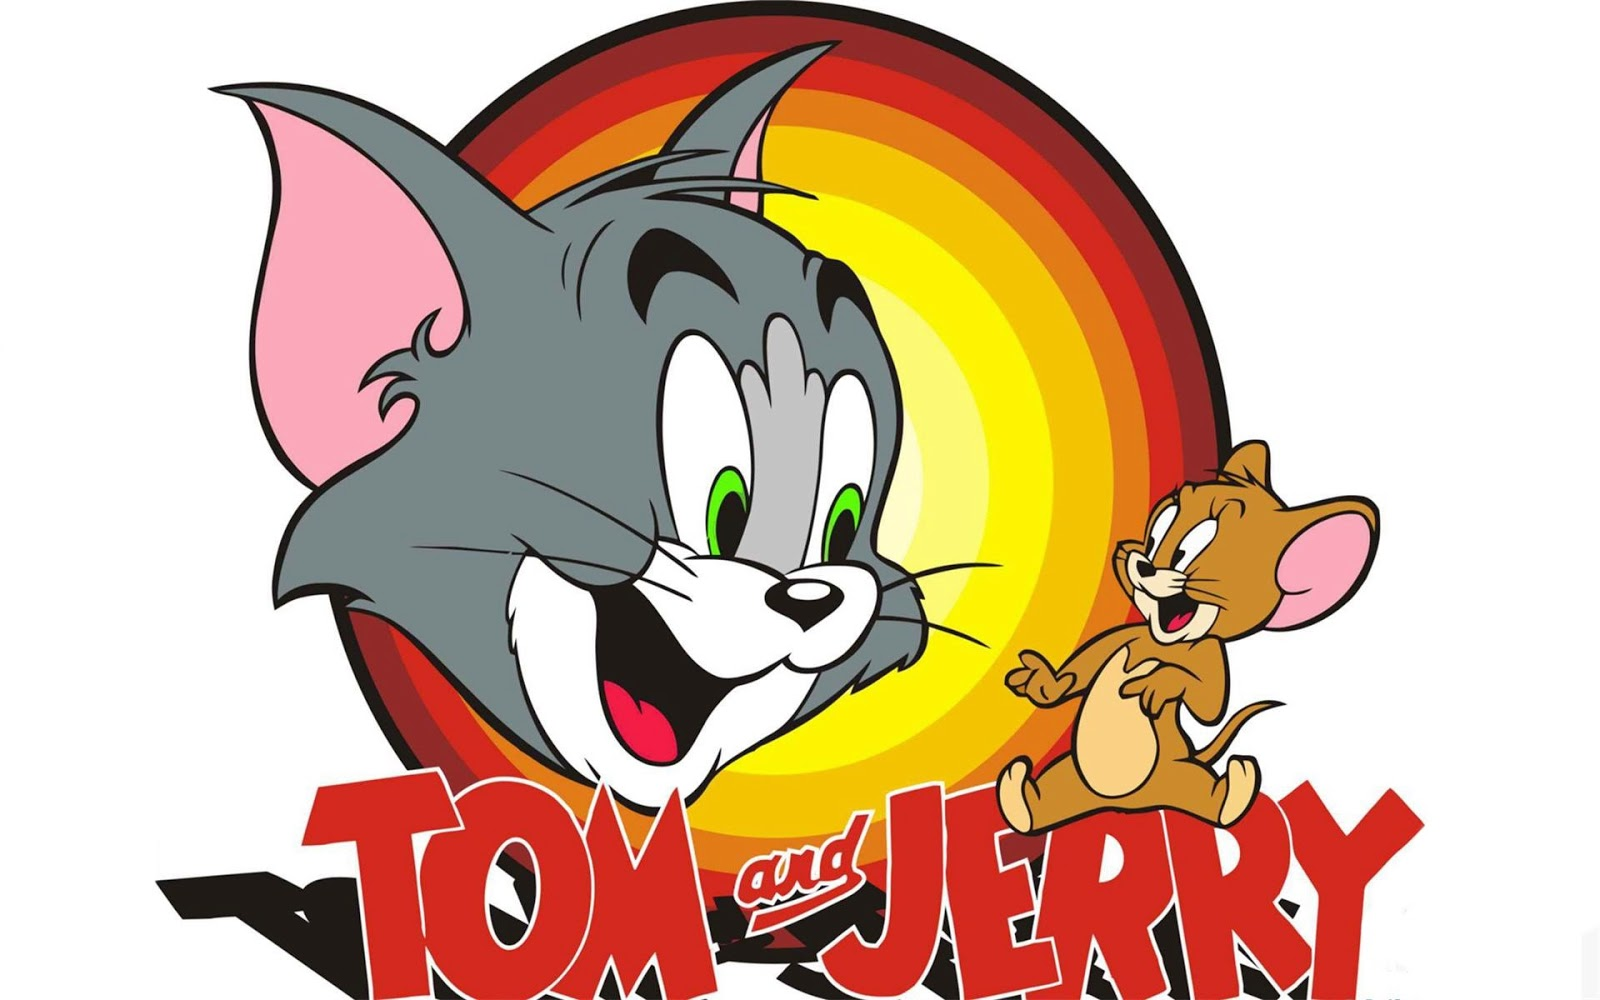 tom and jerry tom and jerry cartoon tom and jerry cartoon